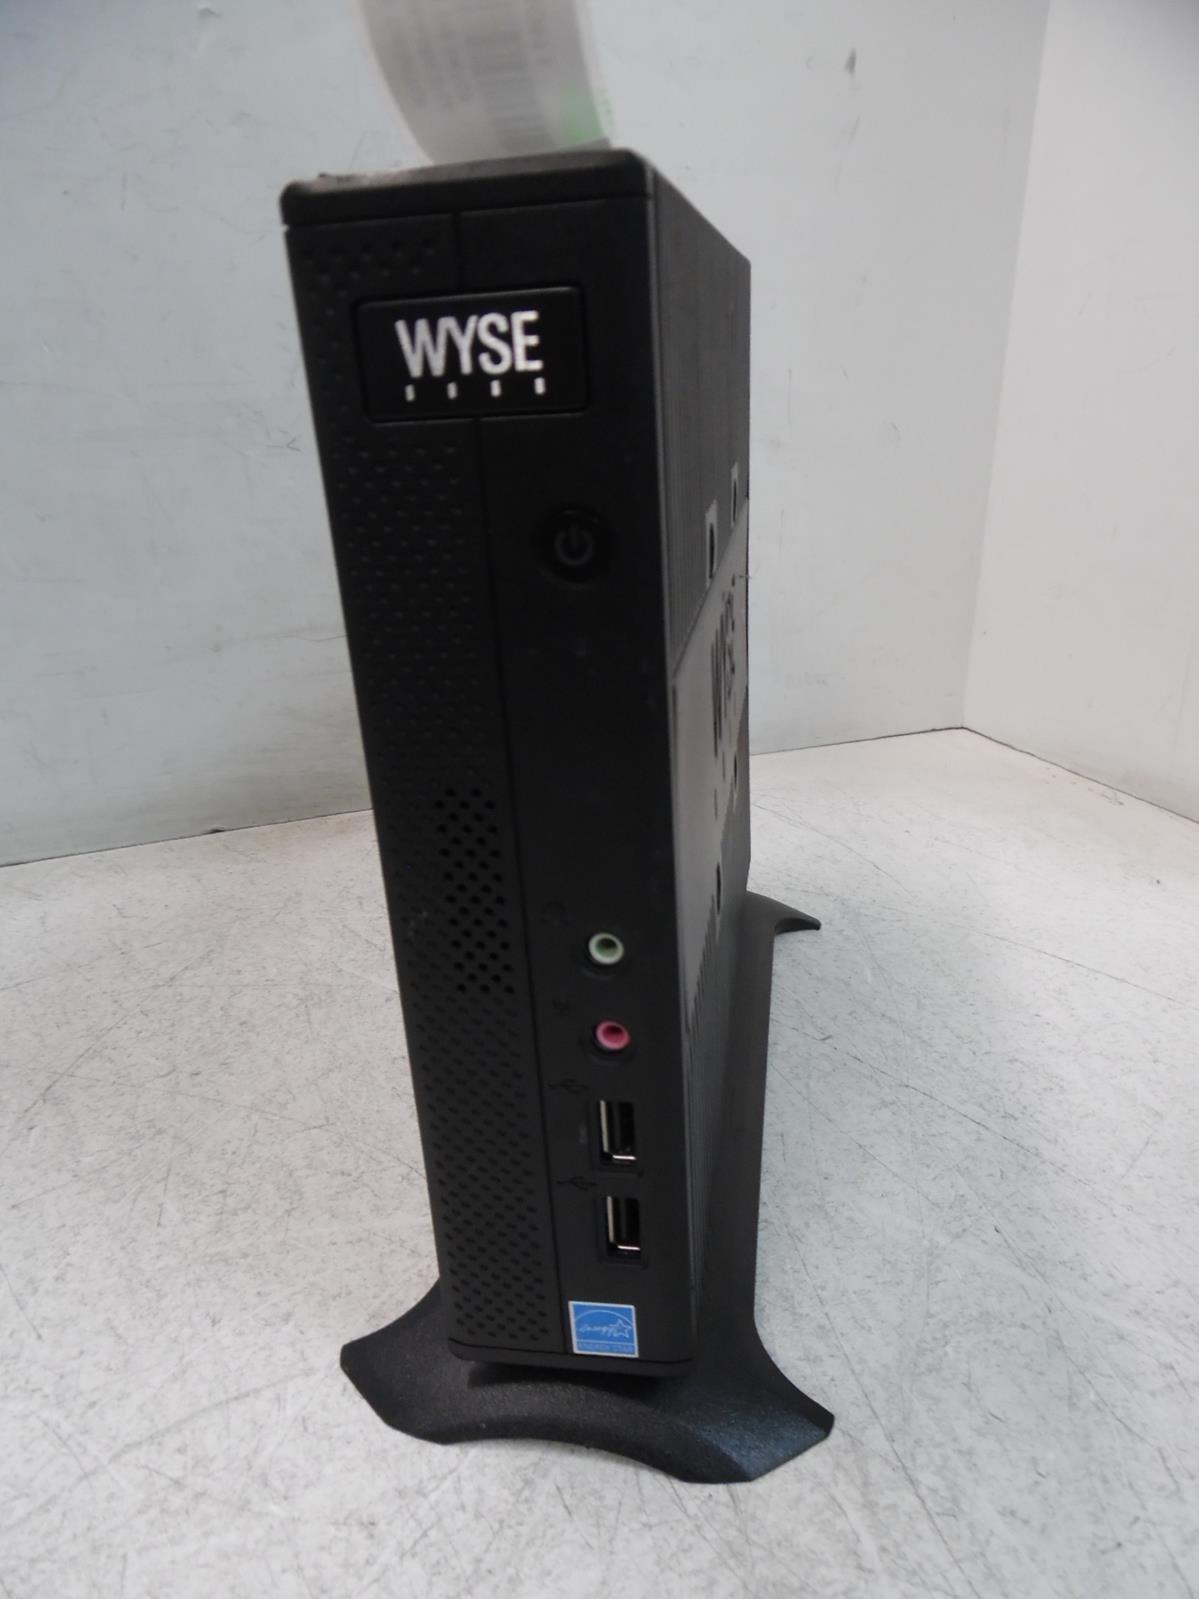 57697-ZX0_37571_base